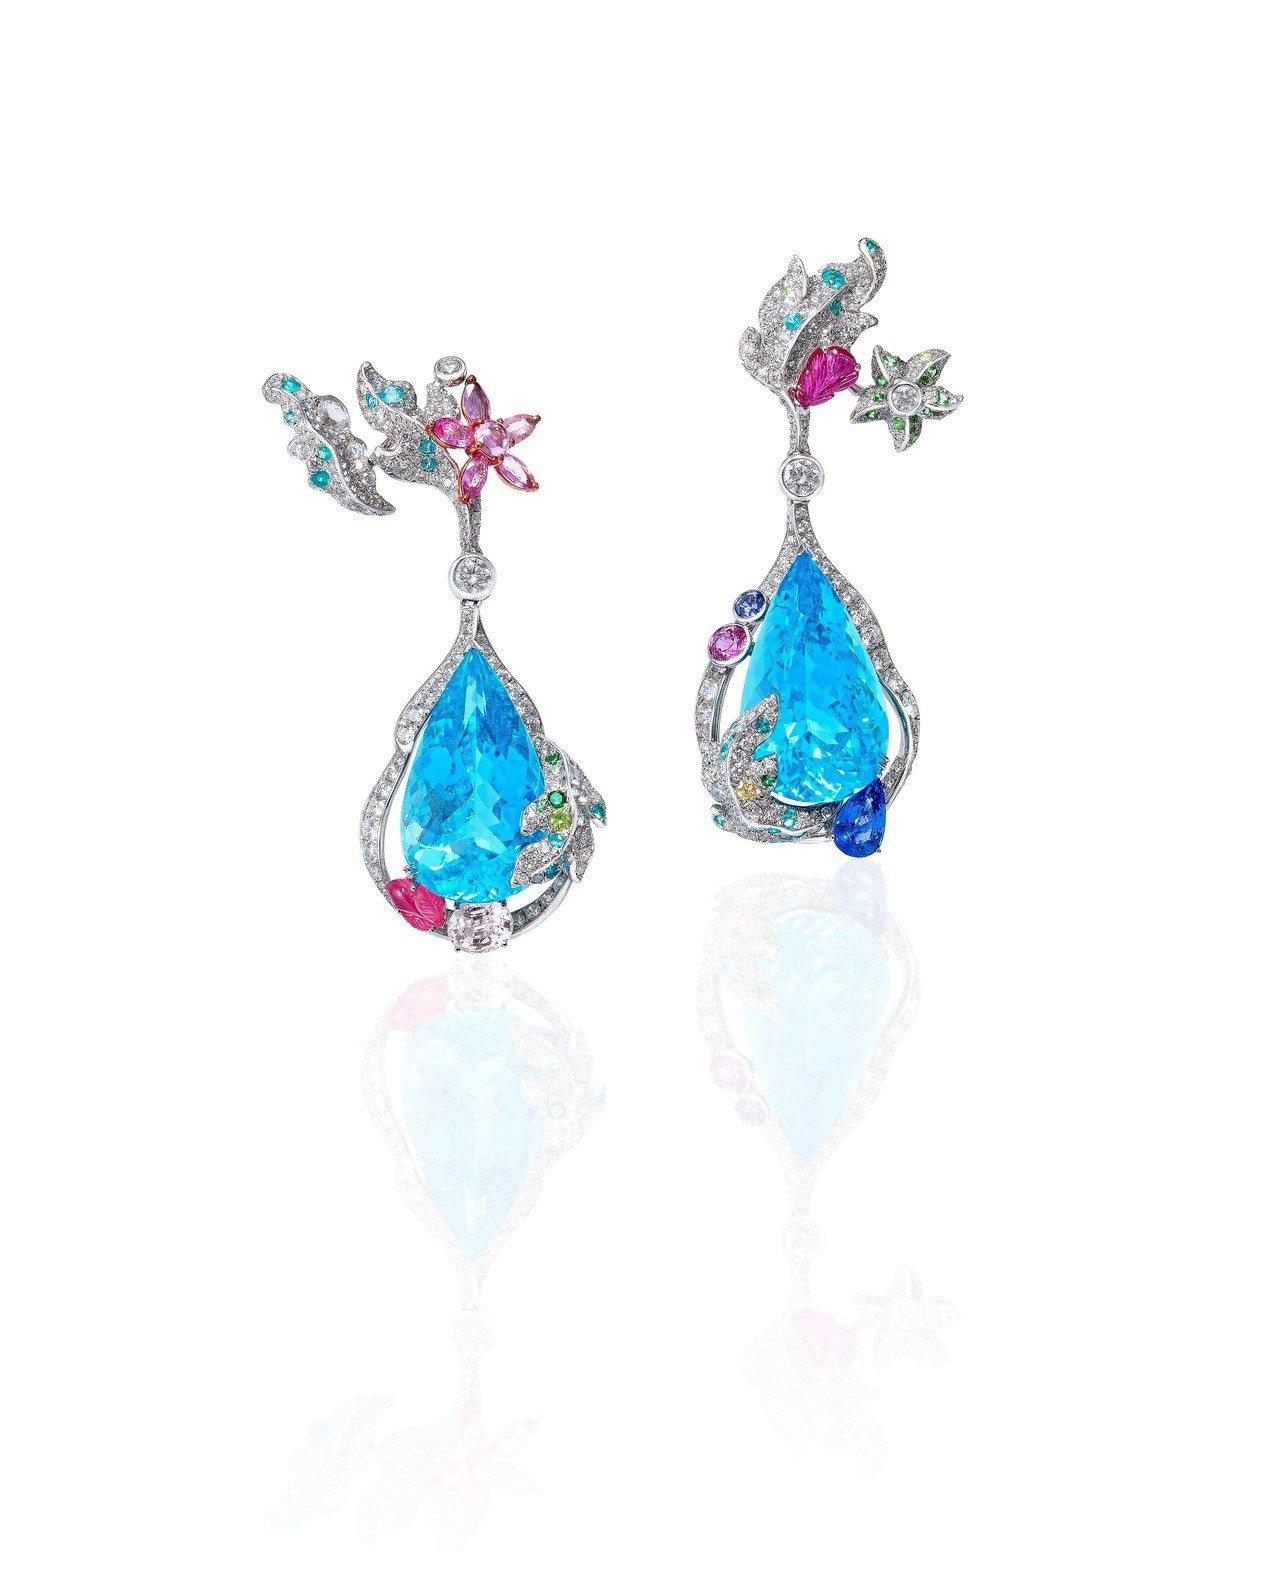 Anna Hu海之頌海水藍寶耳環,以兩顆海水藍寶為主石,搭配彩色剛玉、黃鑽、玫瑰...